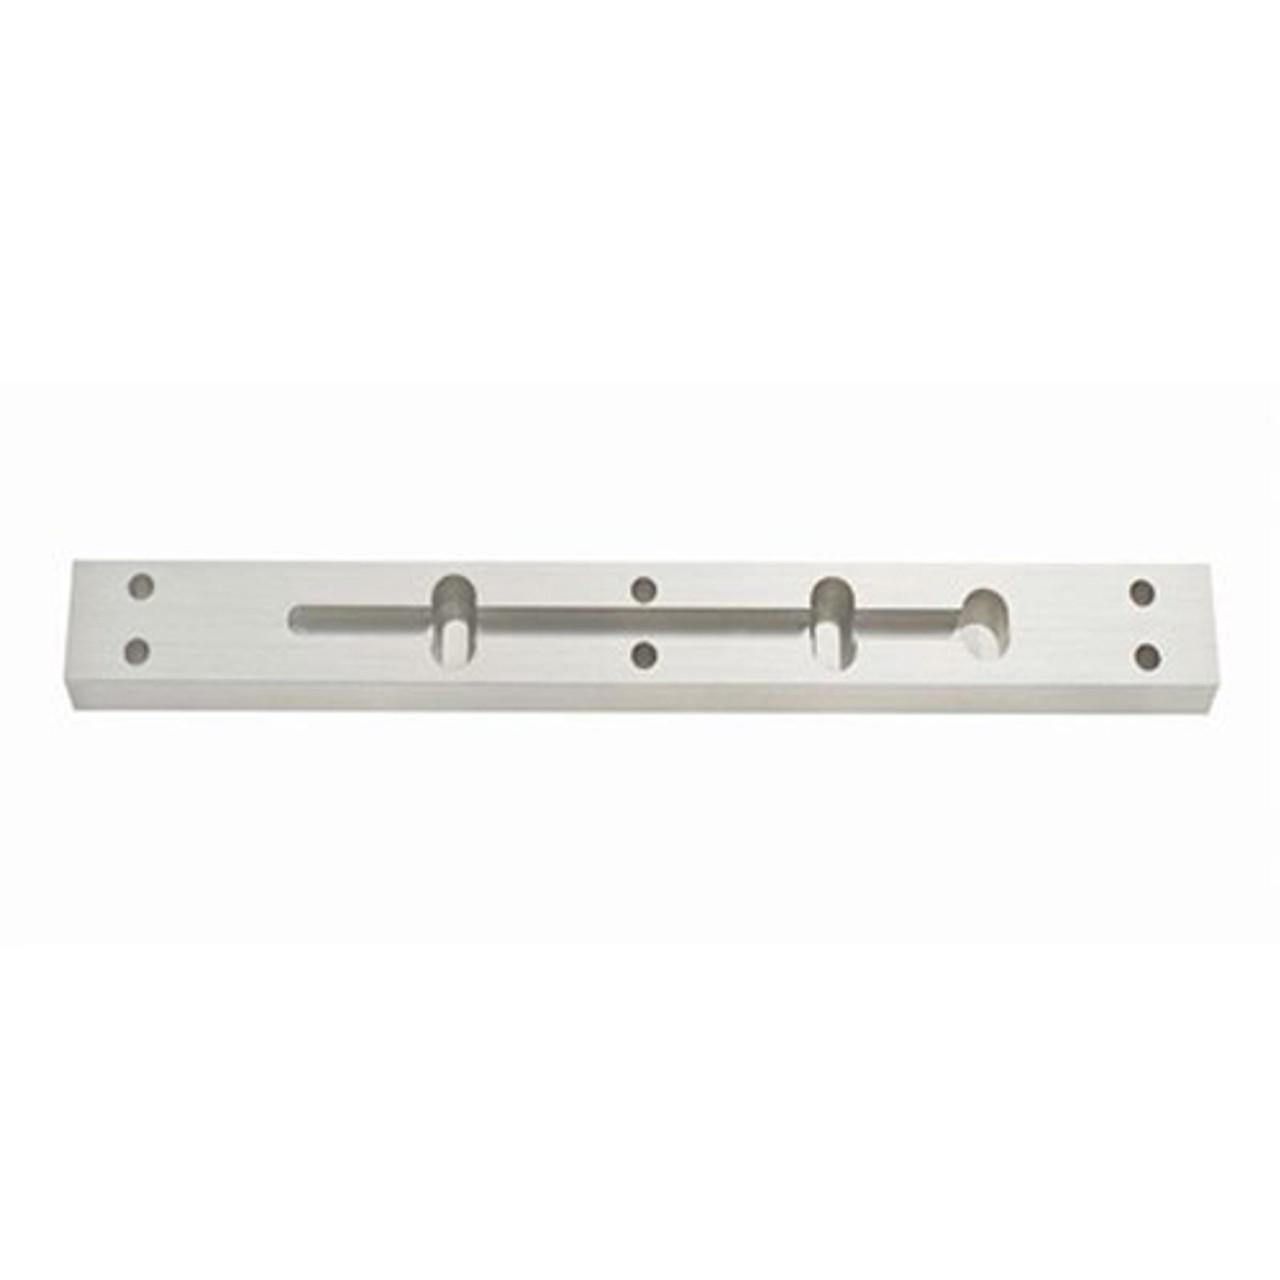 ASP-AM6300 ASP Alarm Control Mounting Brackets For Magnetic Locks